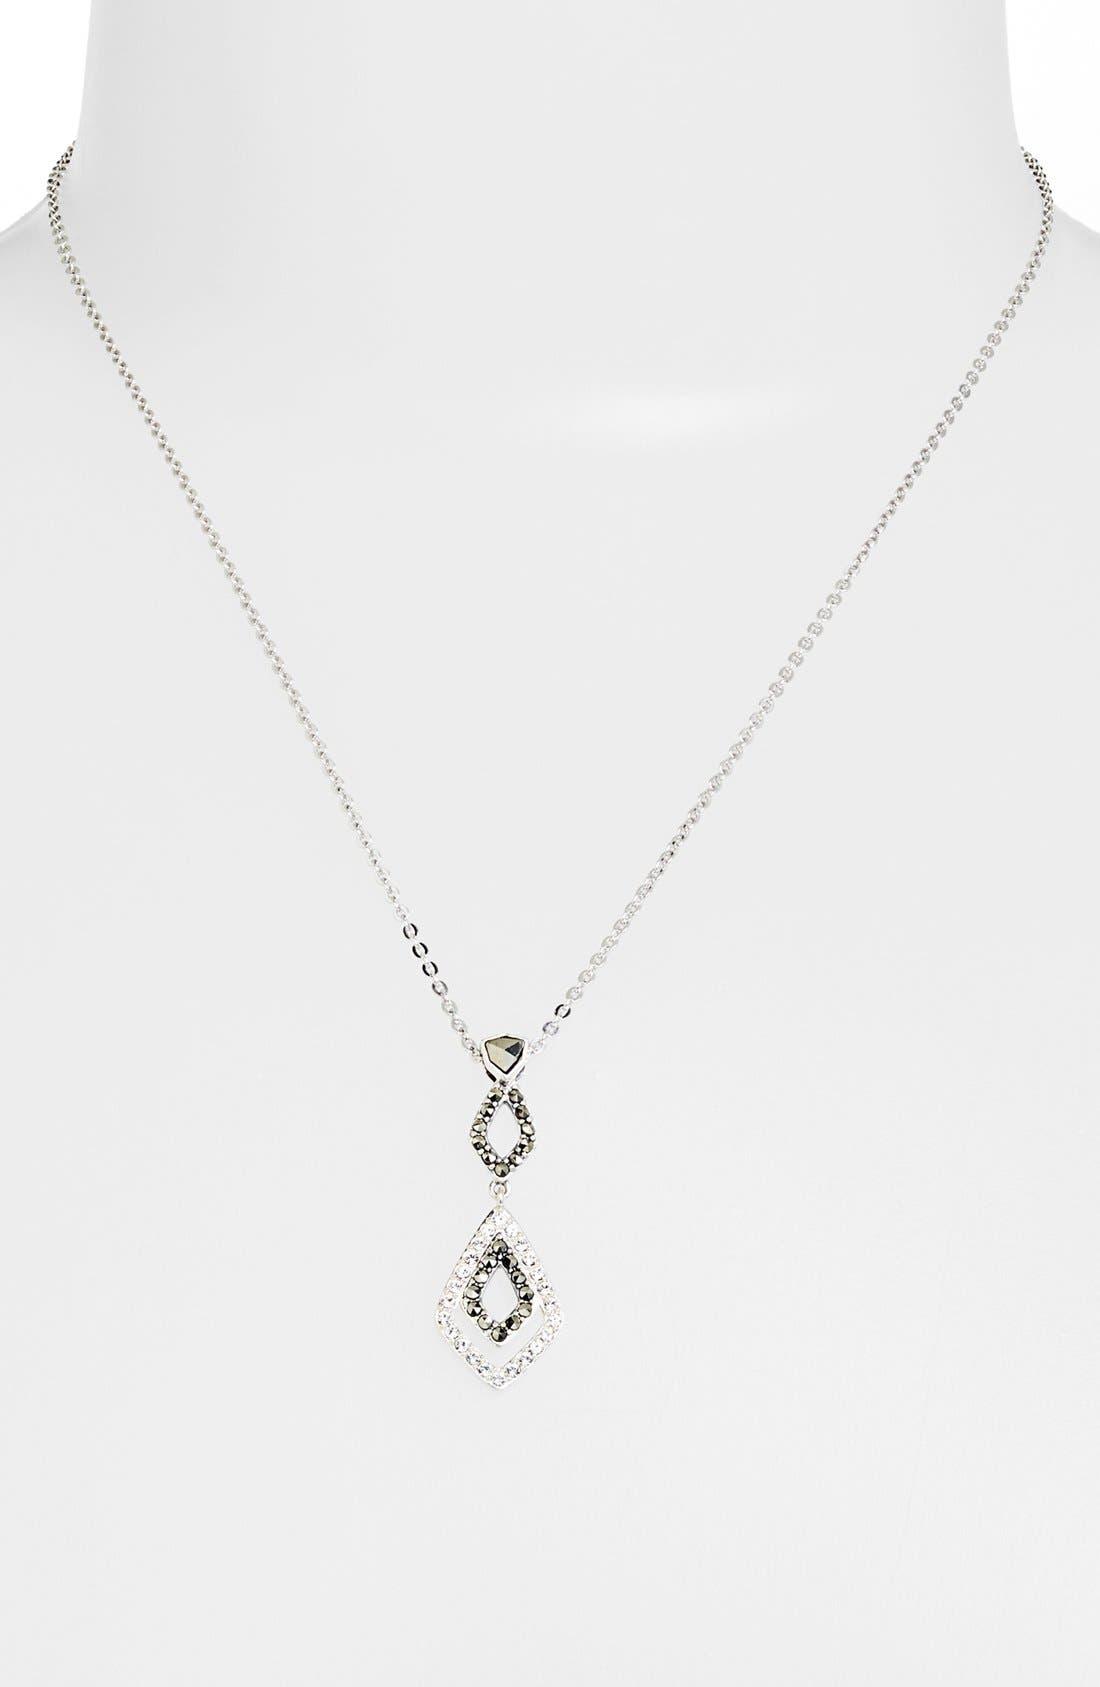 Main Image - Judith Jack 'Elegante Envy' Pendant Necklace